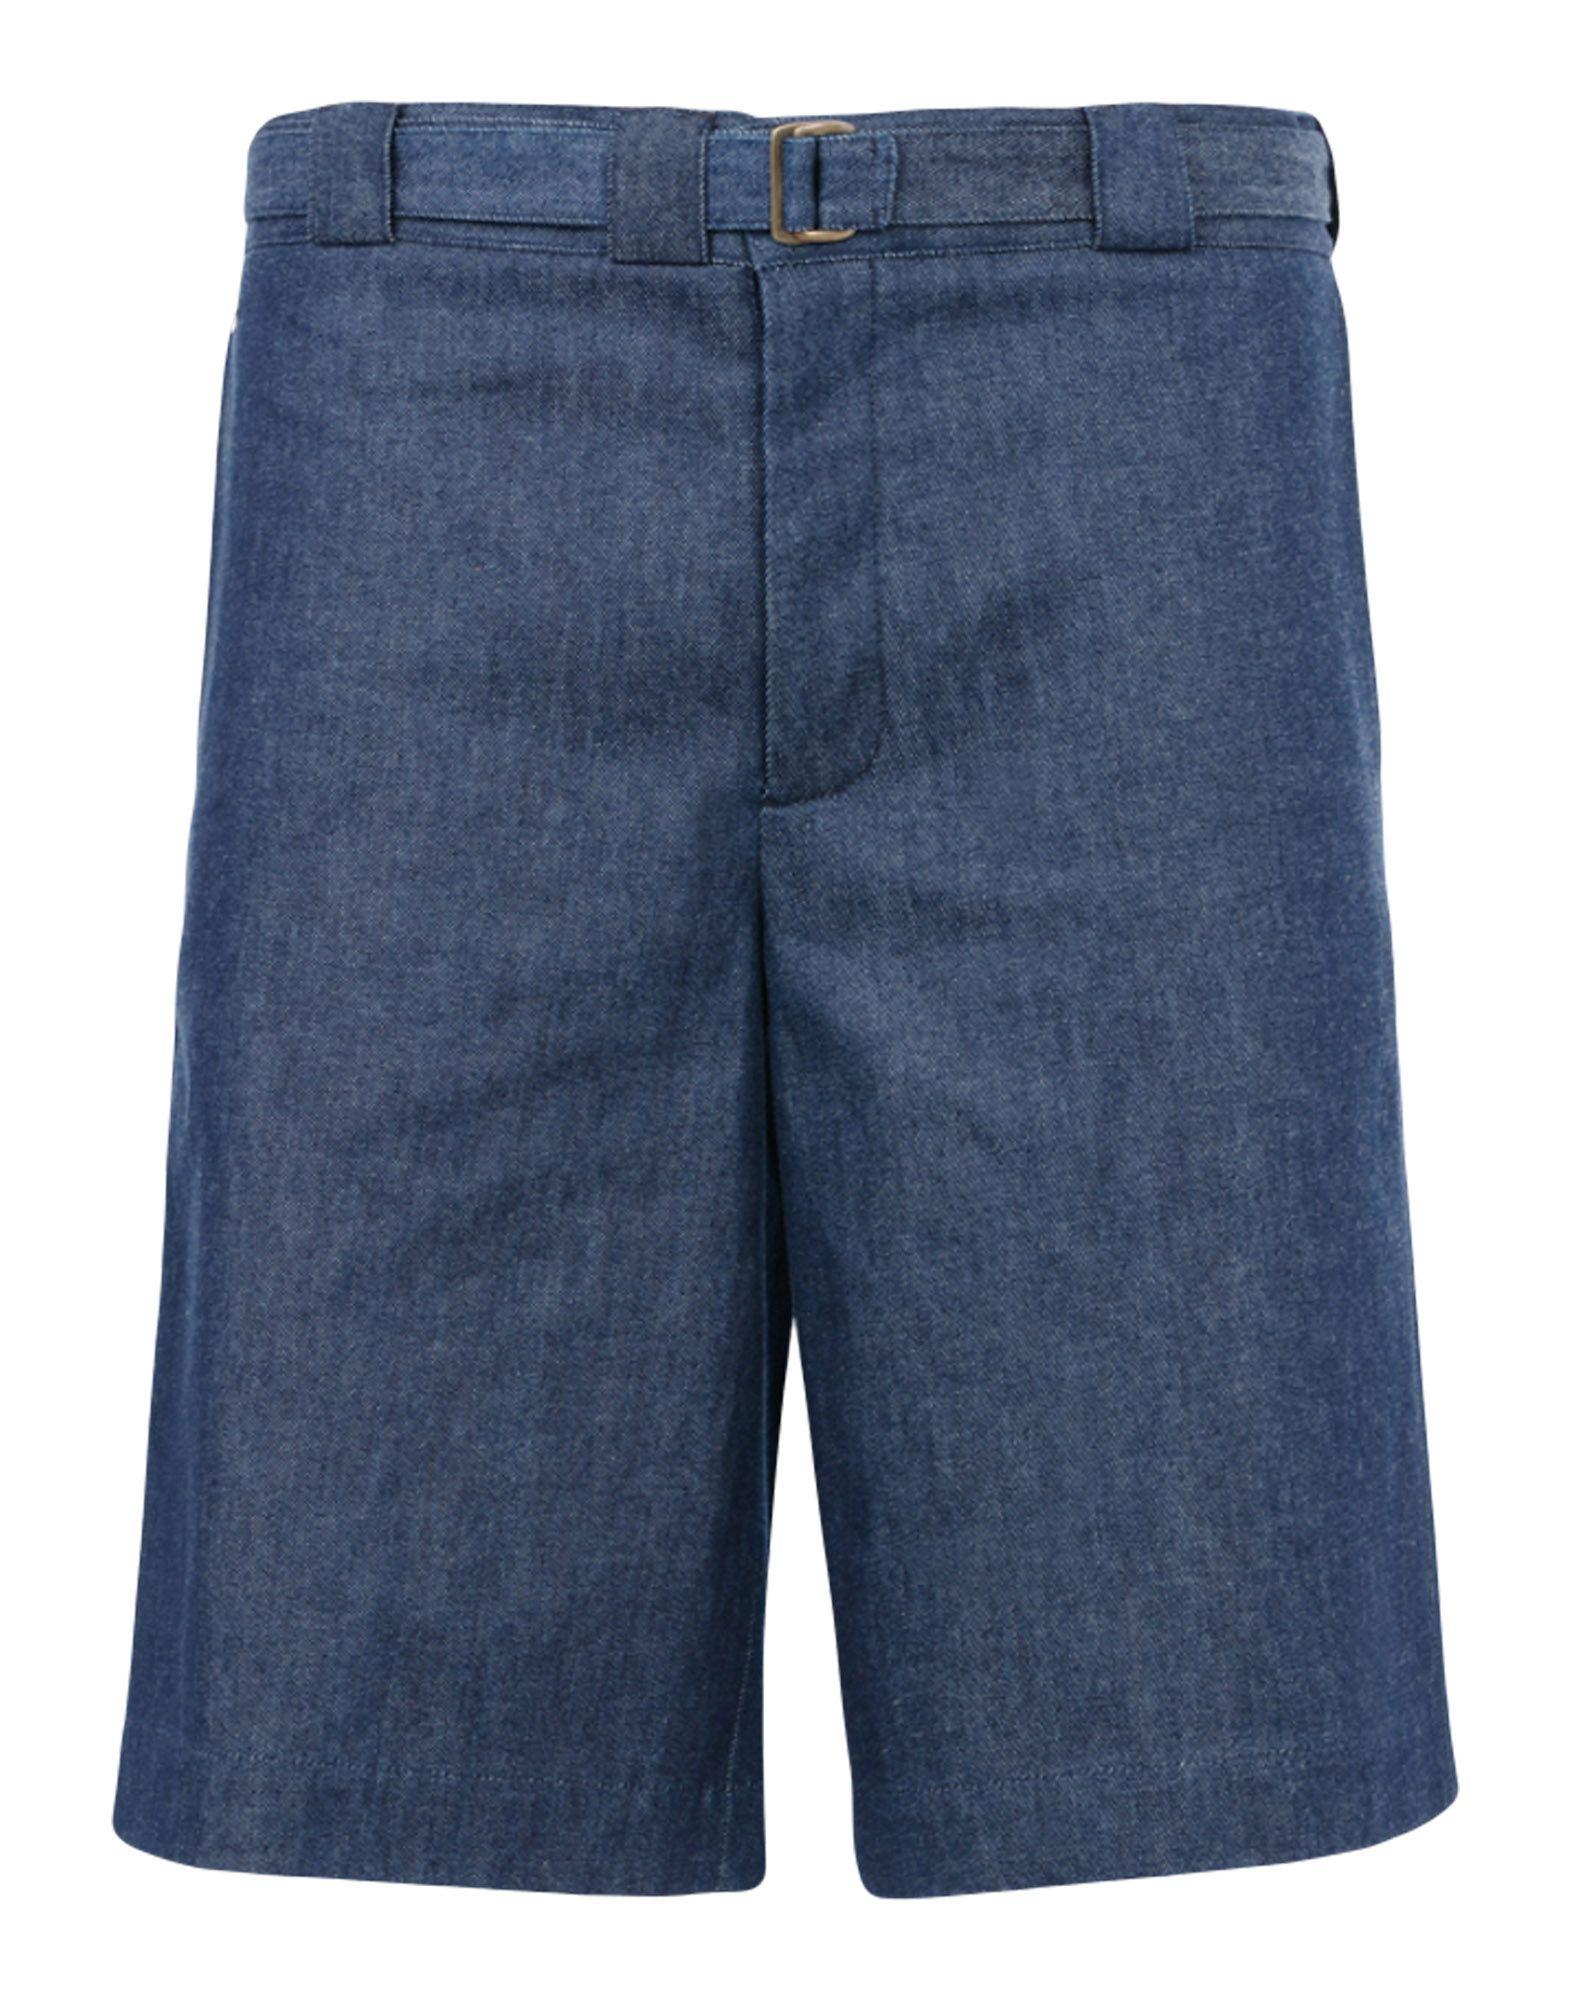 Shorts Jeans Missoni Uomo - Acquista online su